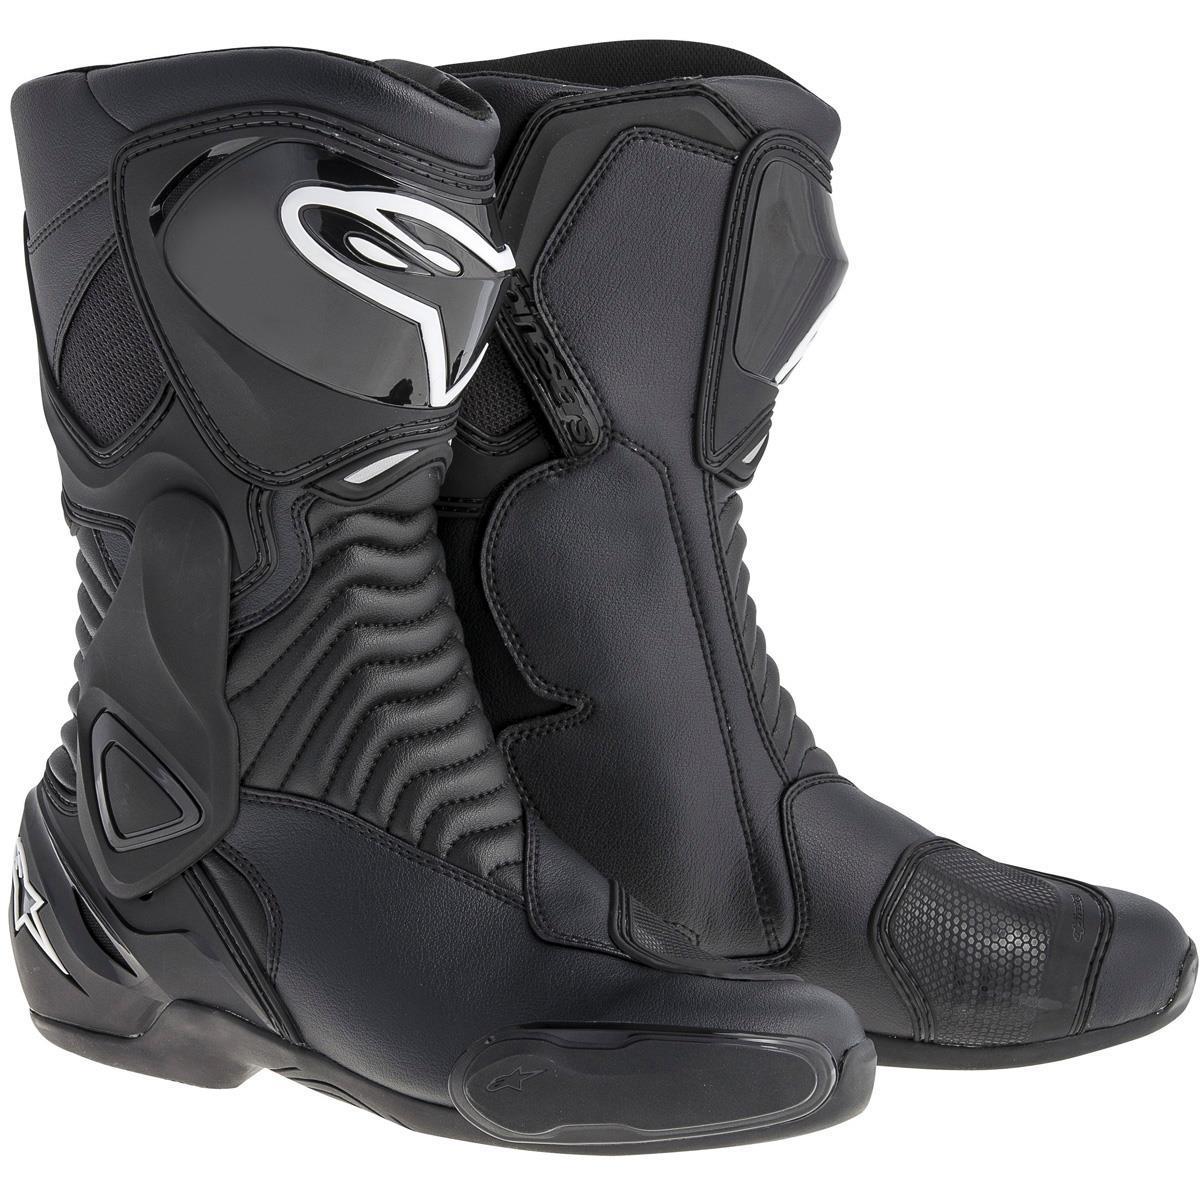 Alpinestars 14' SMX-6 Boots